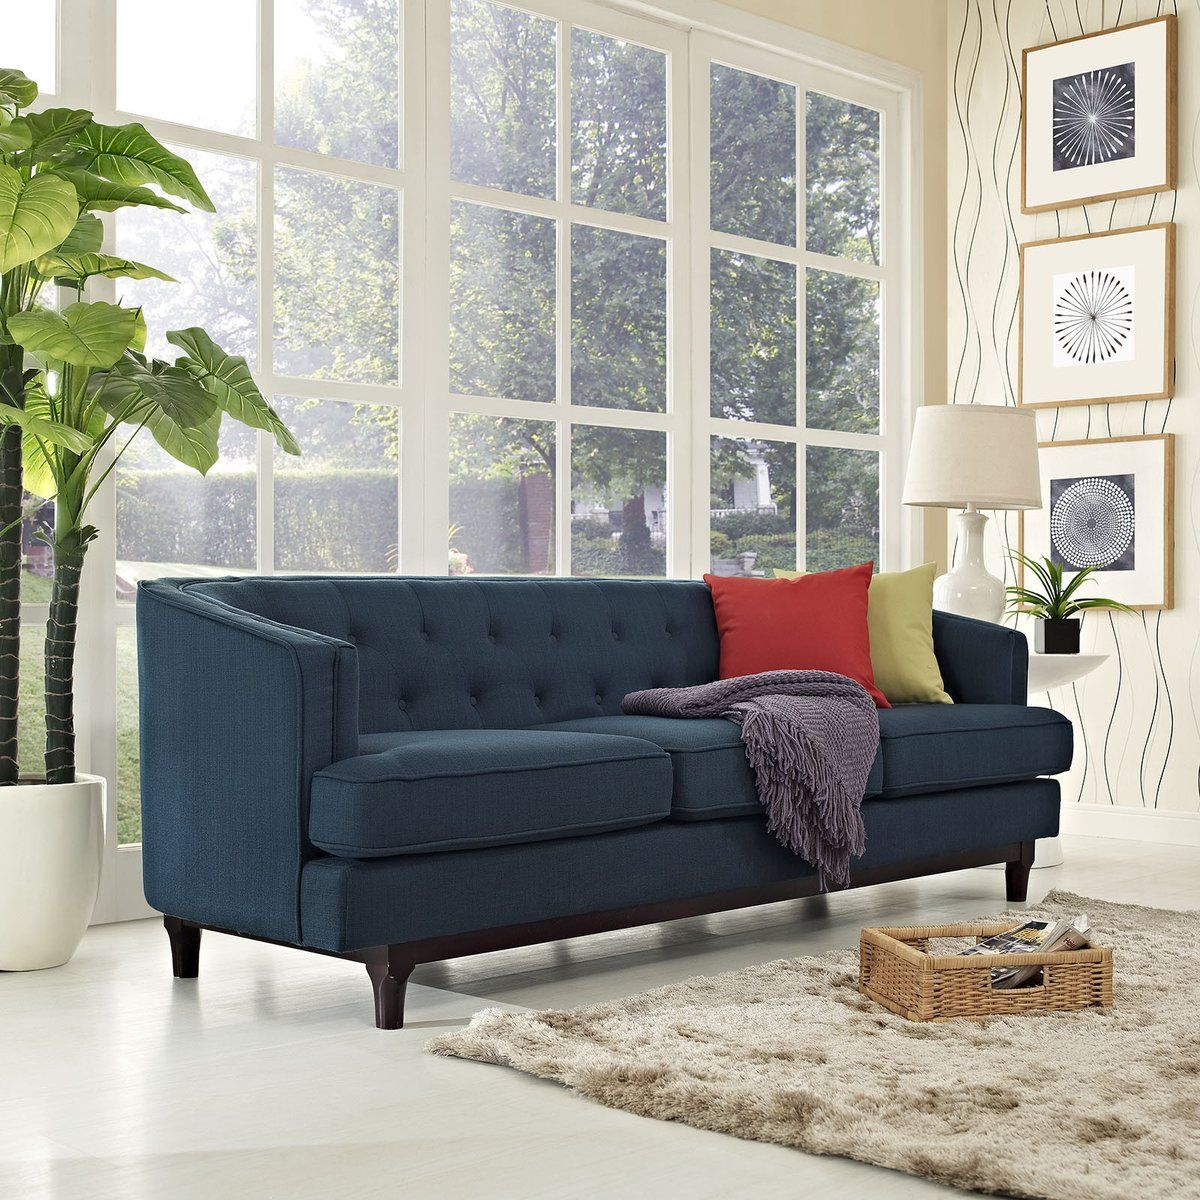 coastline sofa azure in 2019 shop the look transitional design rh pinterest com